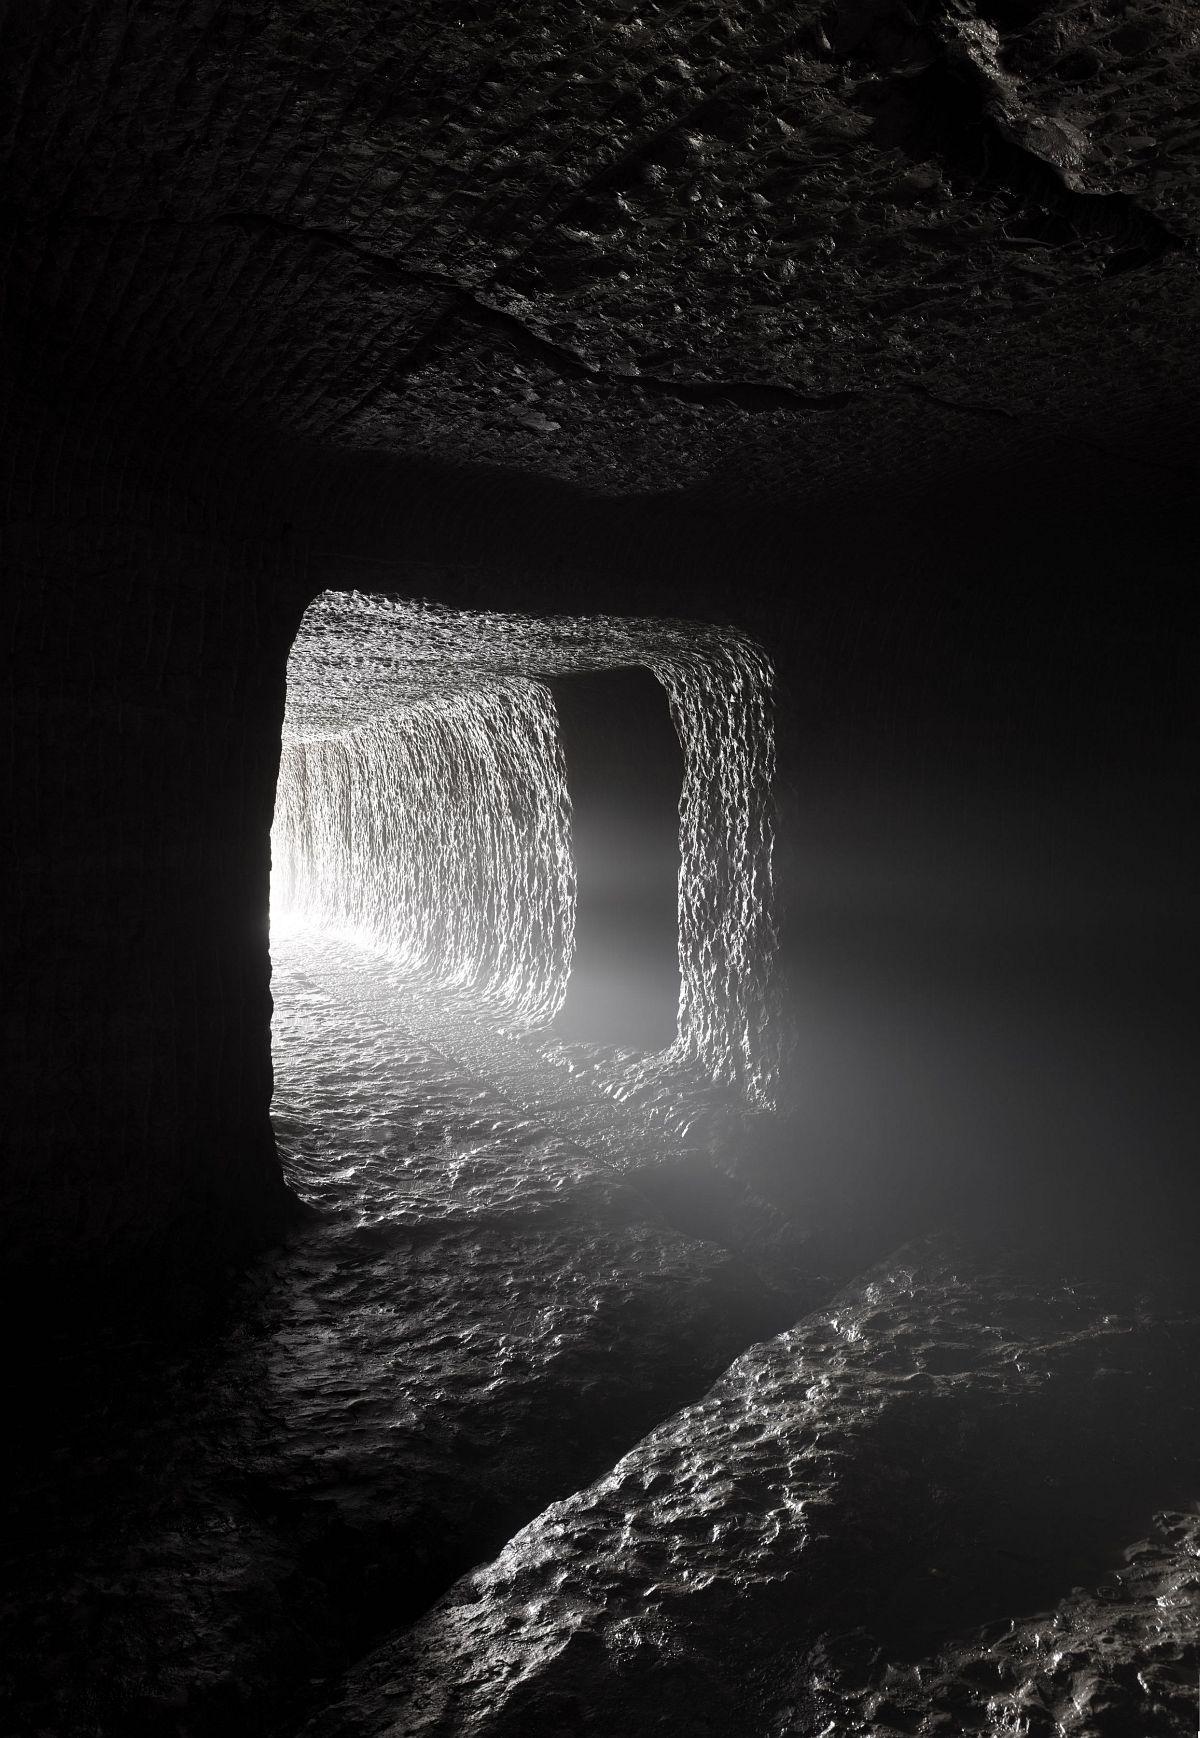 Taca Sui 塔可 Light Through the Mountain 穿山之光 2018 Archival pigment print 收藏级艺术打印 173 x 120 cm (68 1/4 x 47 1/4 in)